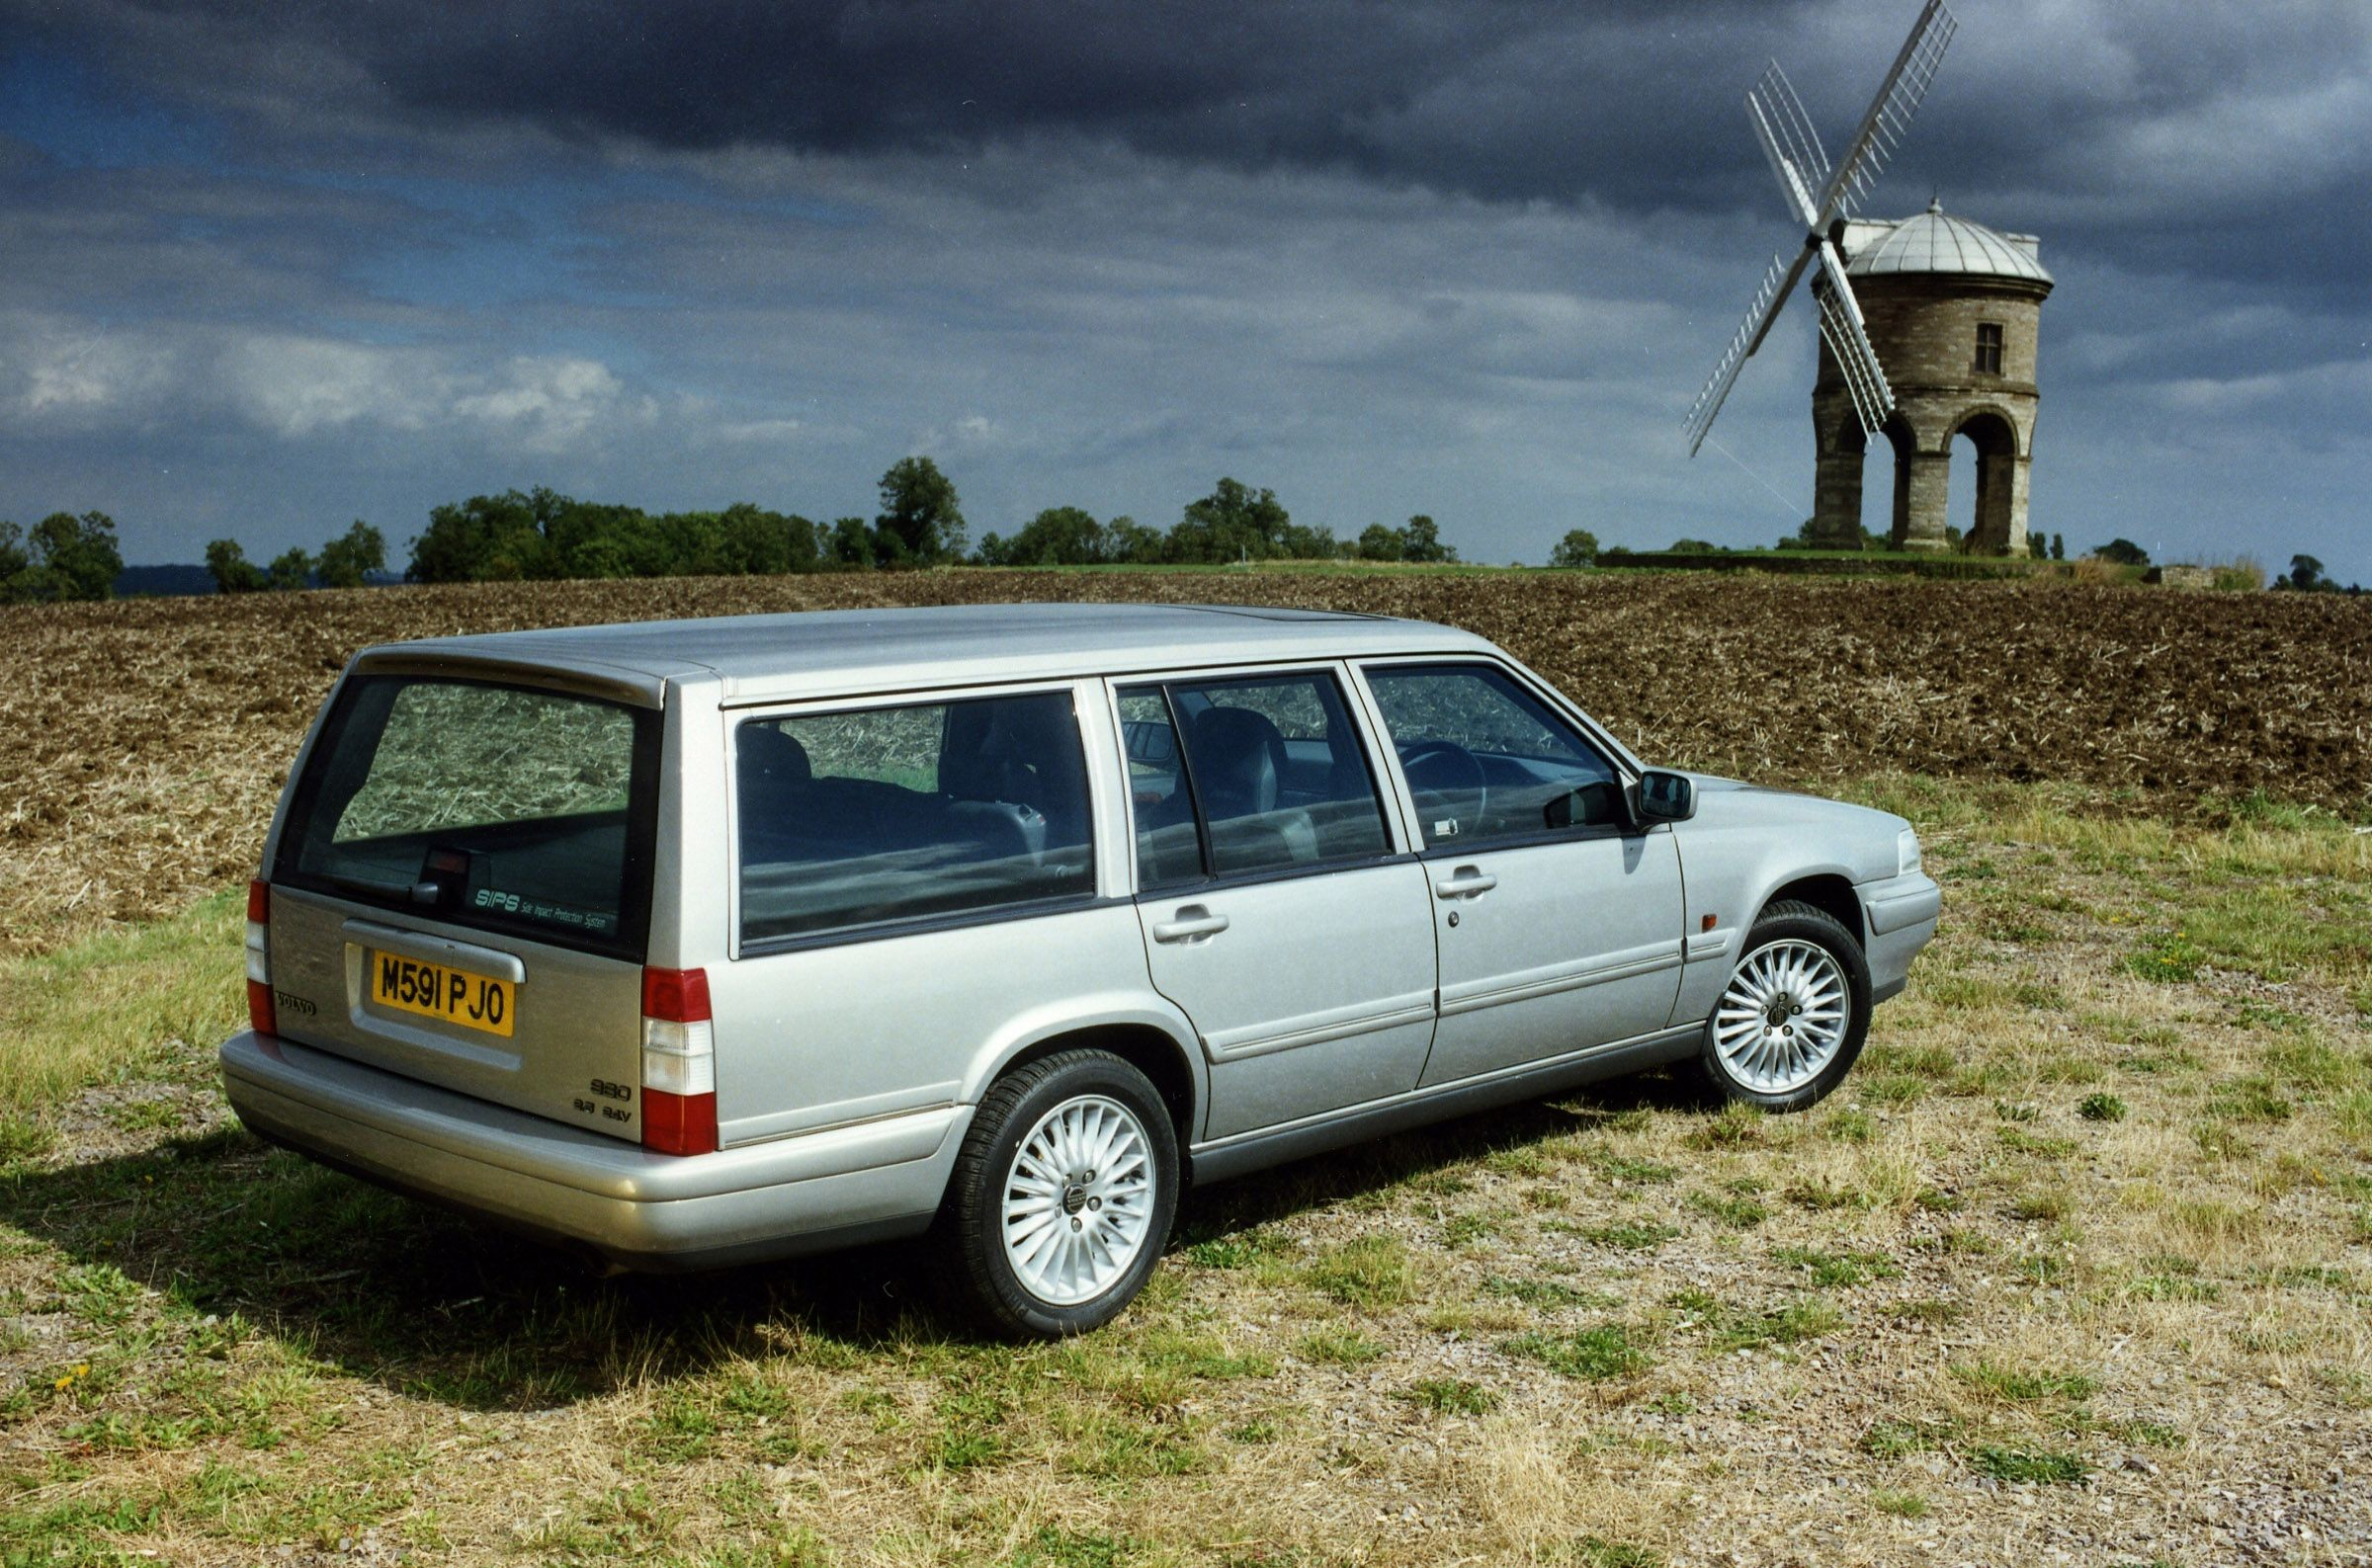 medium resolution of volvo 960 gle 1994 volvo wagon volvo cars volvo s90 alfa